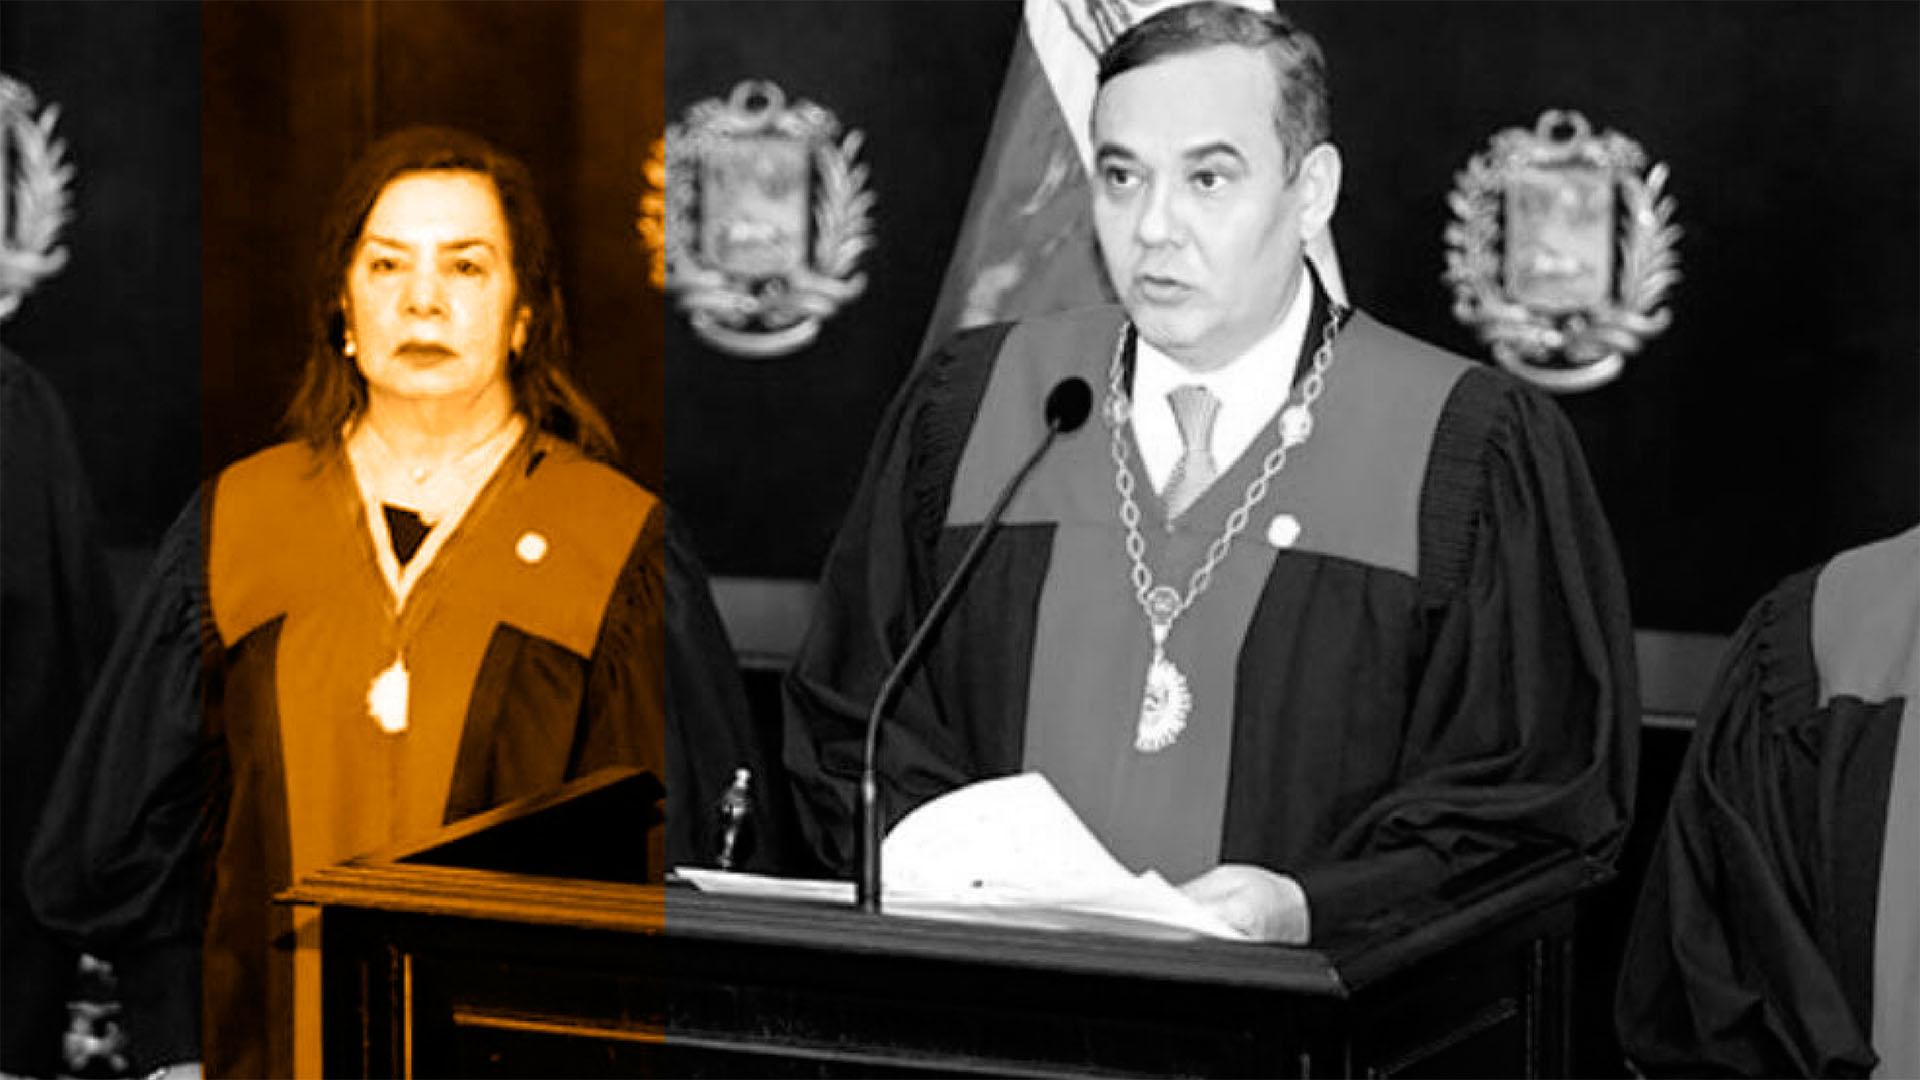 Runrunes de Bocaranda: MEDIO – DISCREPANCIA EN EL TSJ